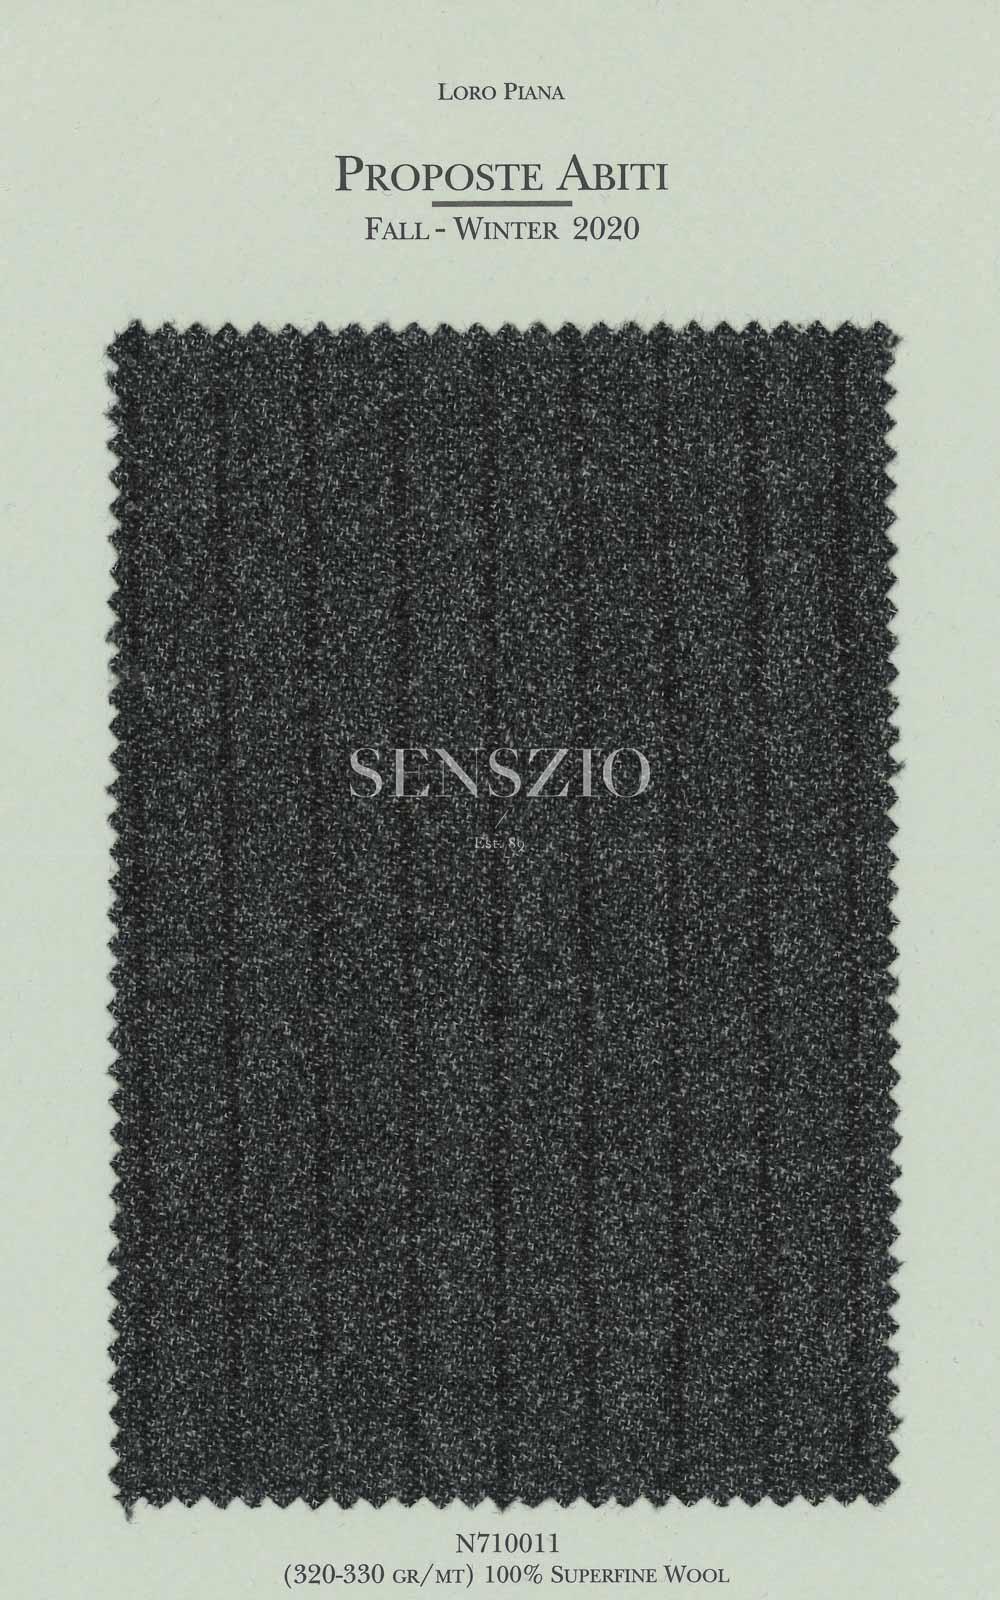 Lpn710011